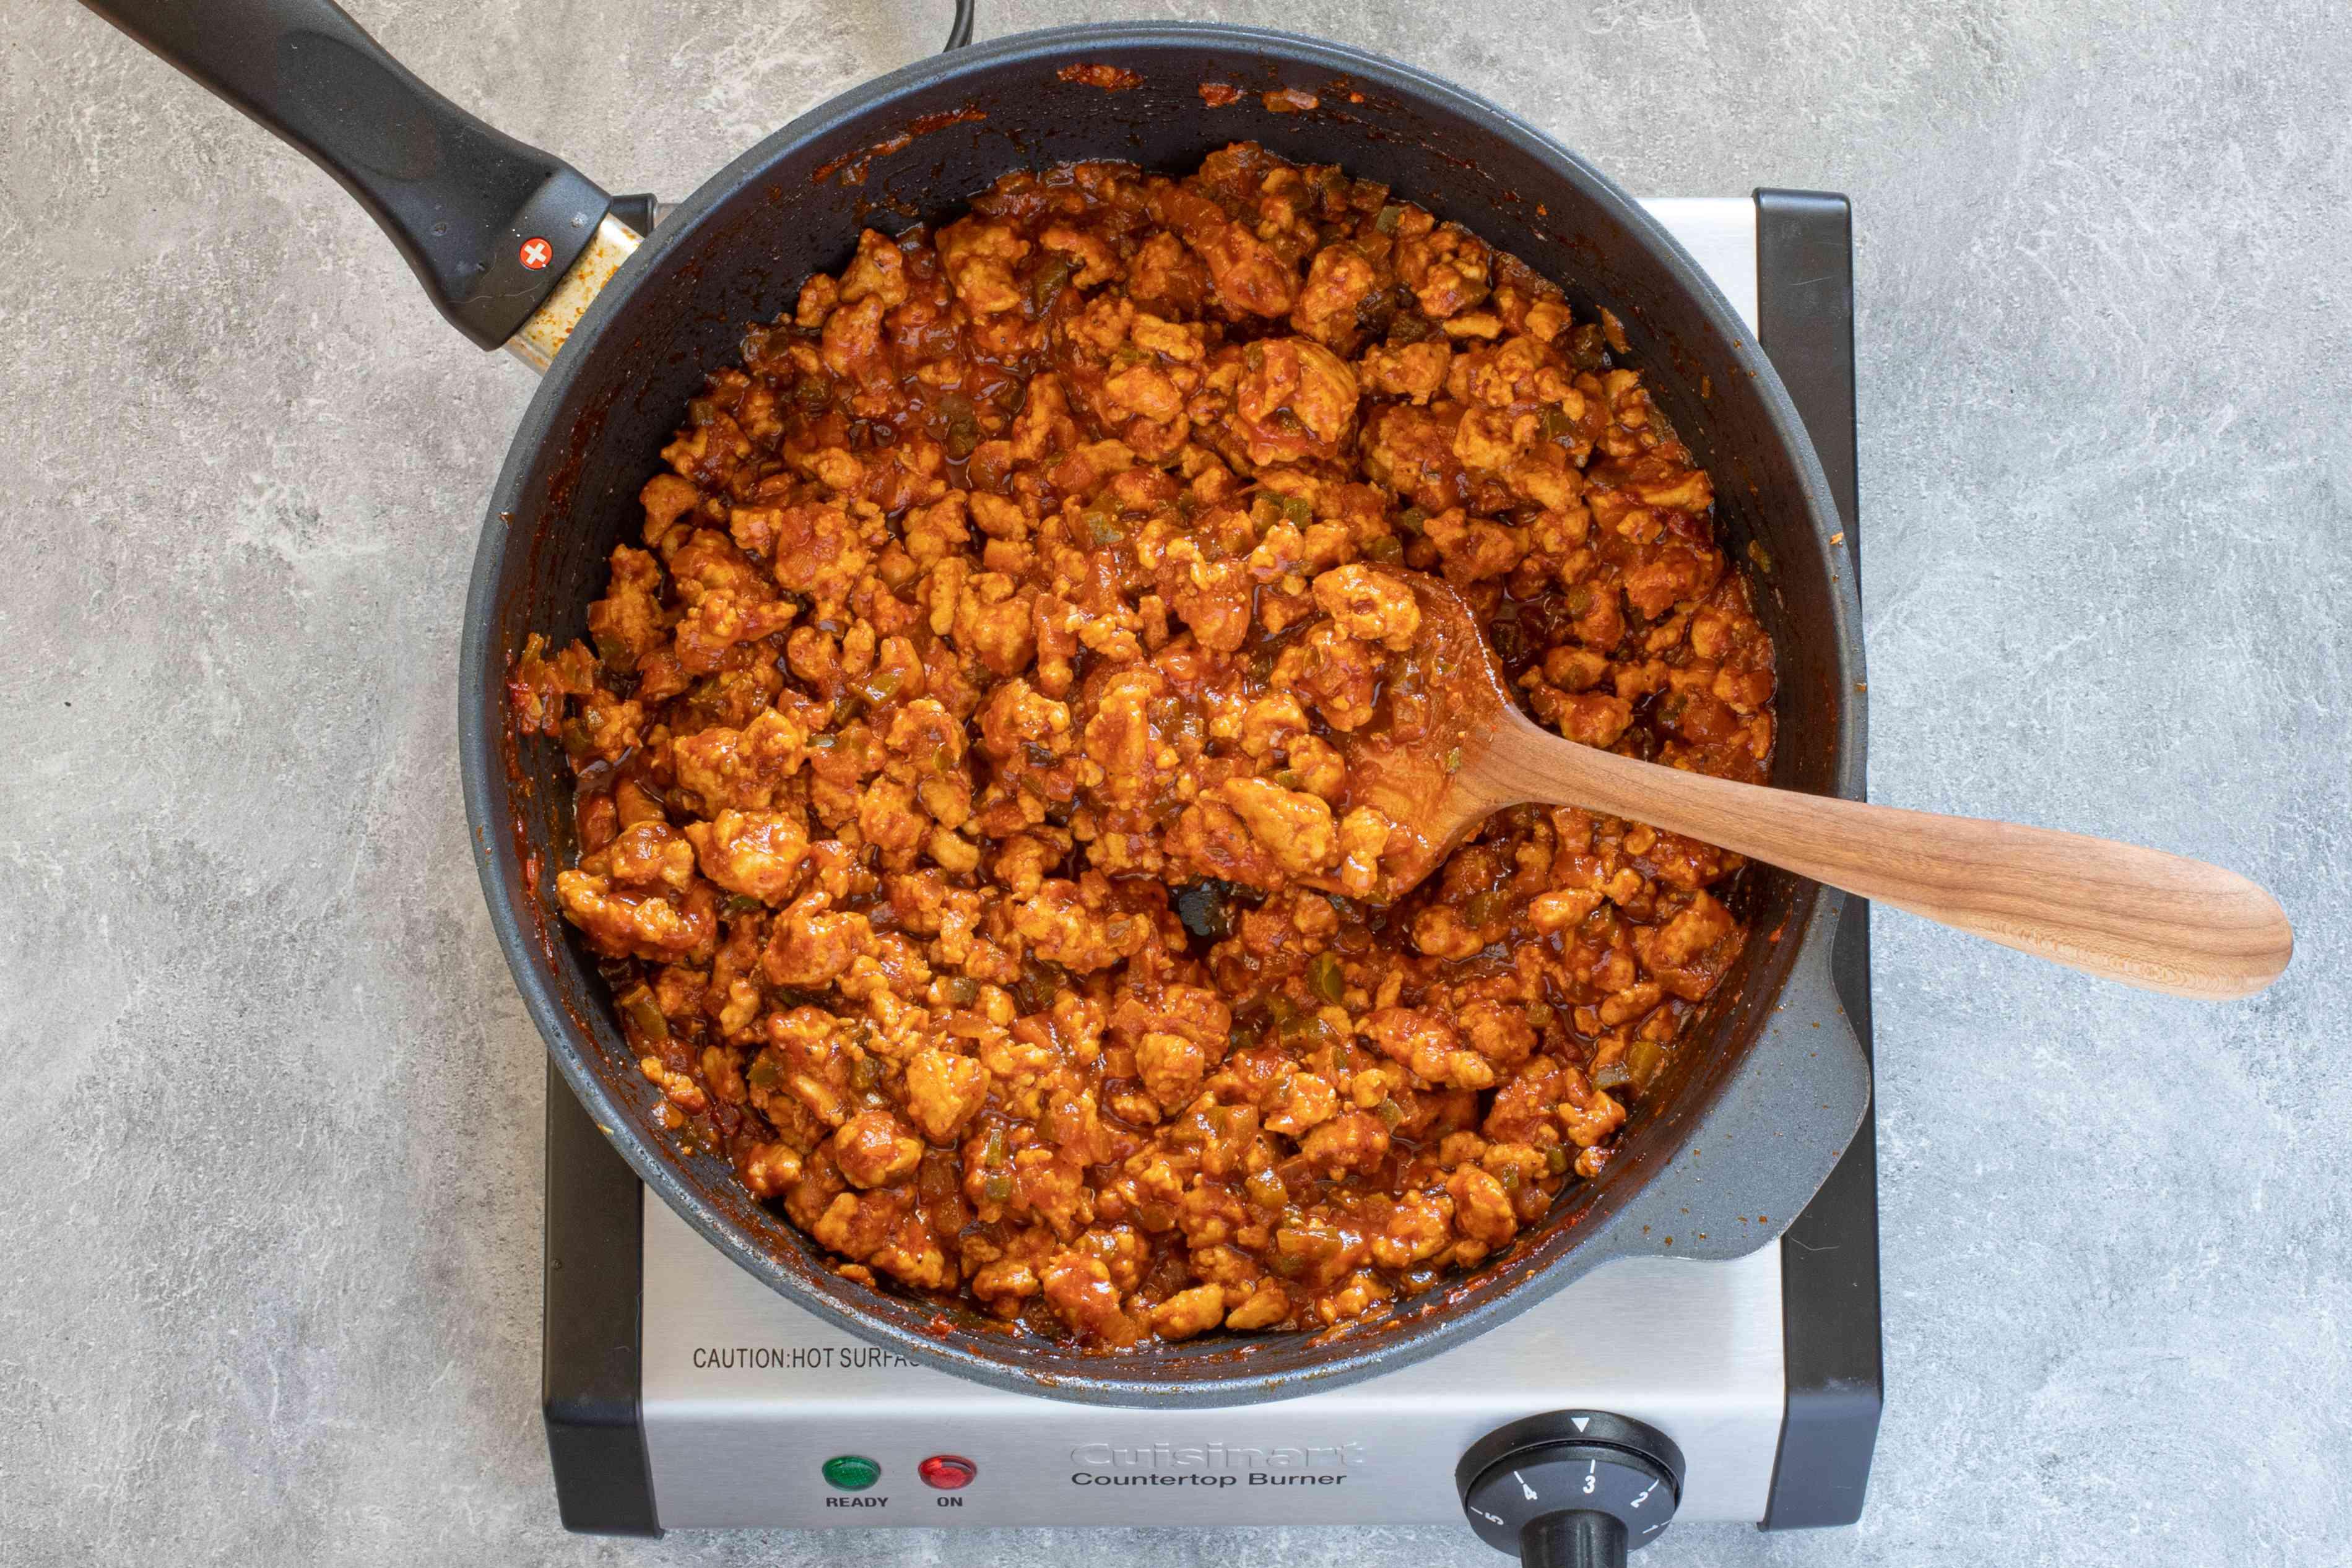 pan with simmered turkey sloppy joe mixture